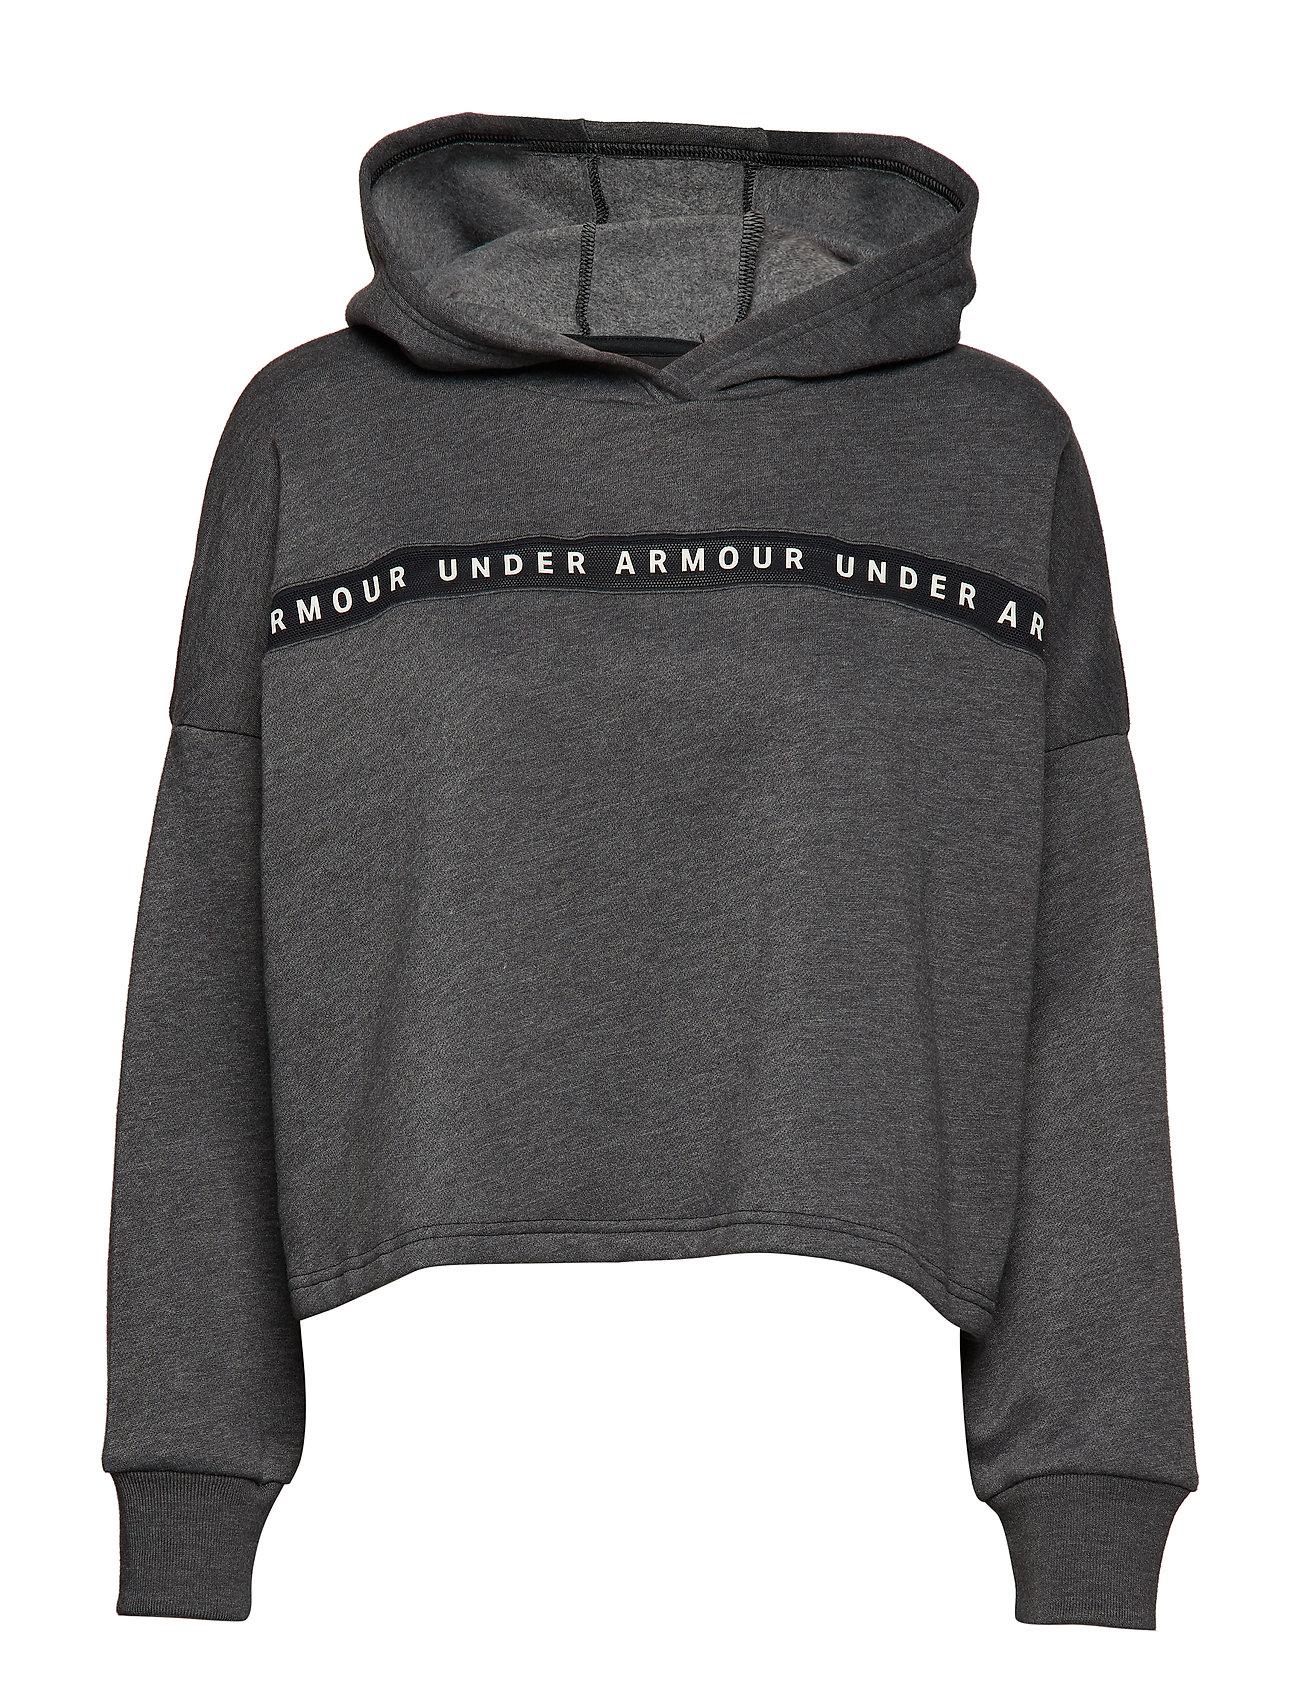 5b4a93fb6 Ua Taped Fleece Hoodie (Black) (38.50 €) - Under Armour - | Boozt.com